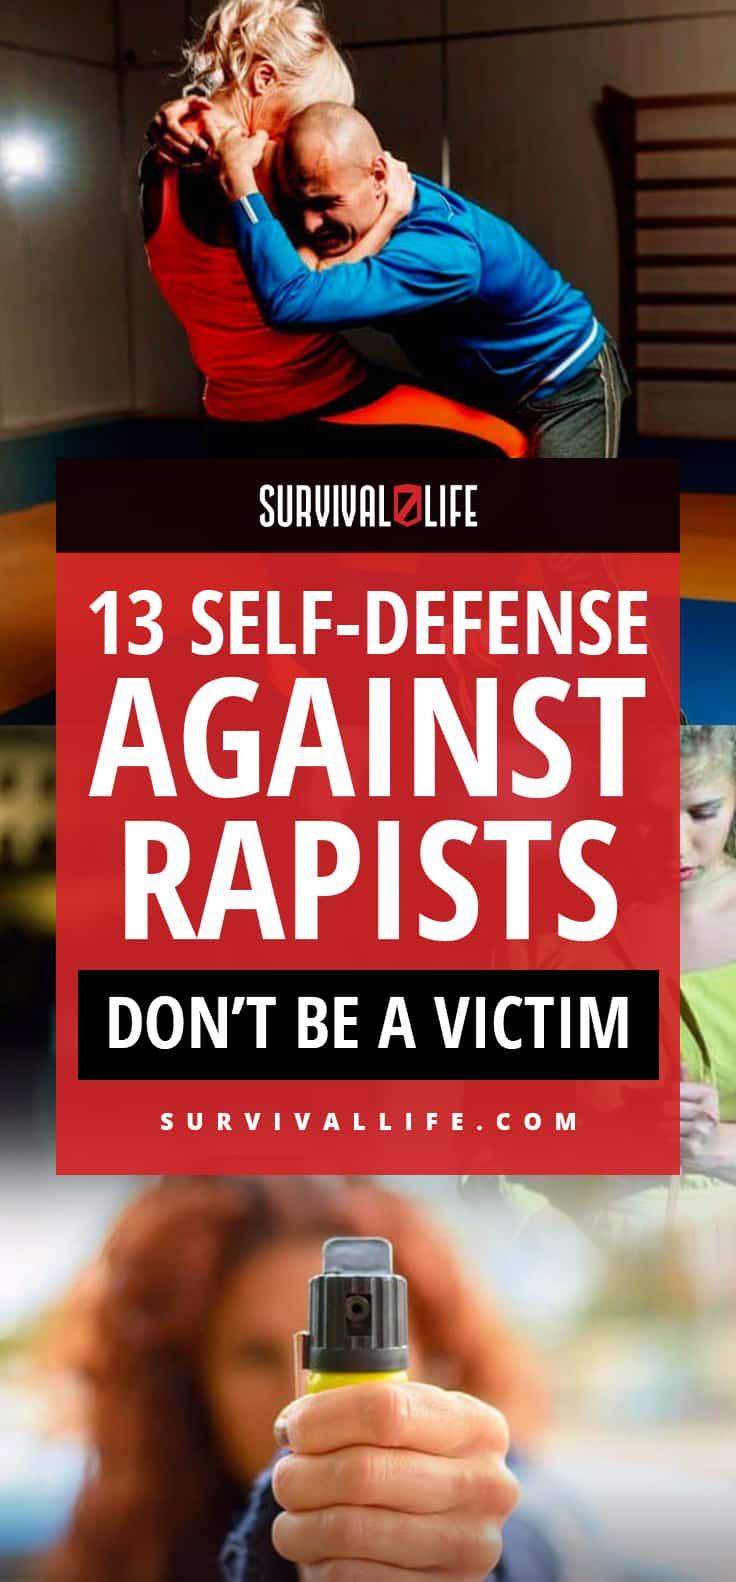 Don't Be A Victim | Self-Defense Against Rapists | https://survivallife.com/self-defense-against-rapists/